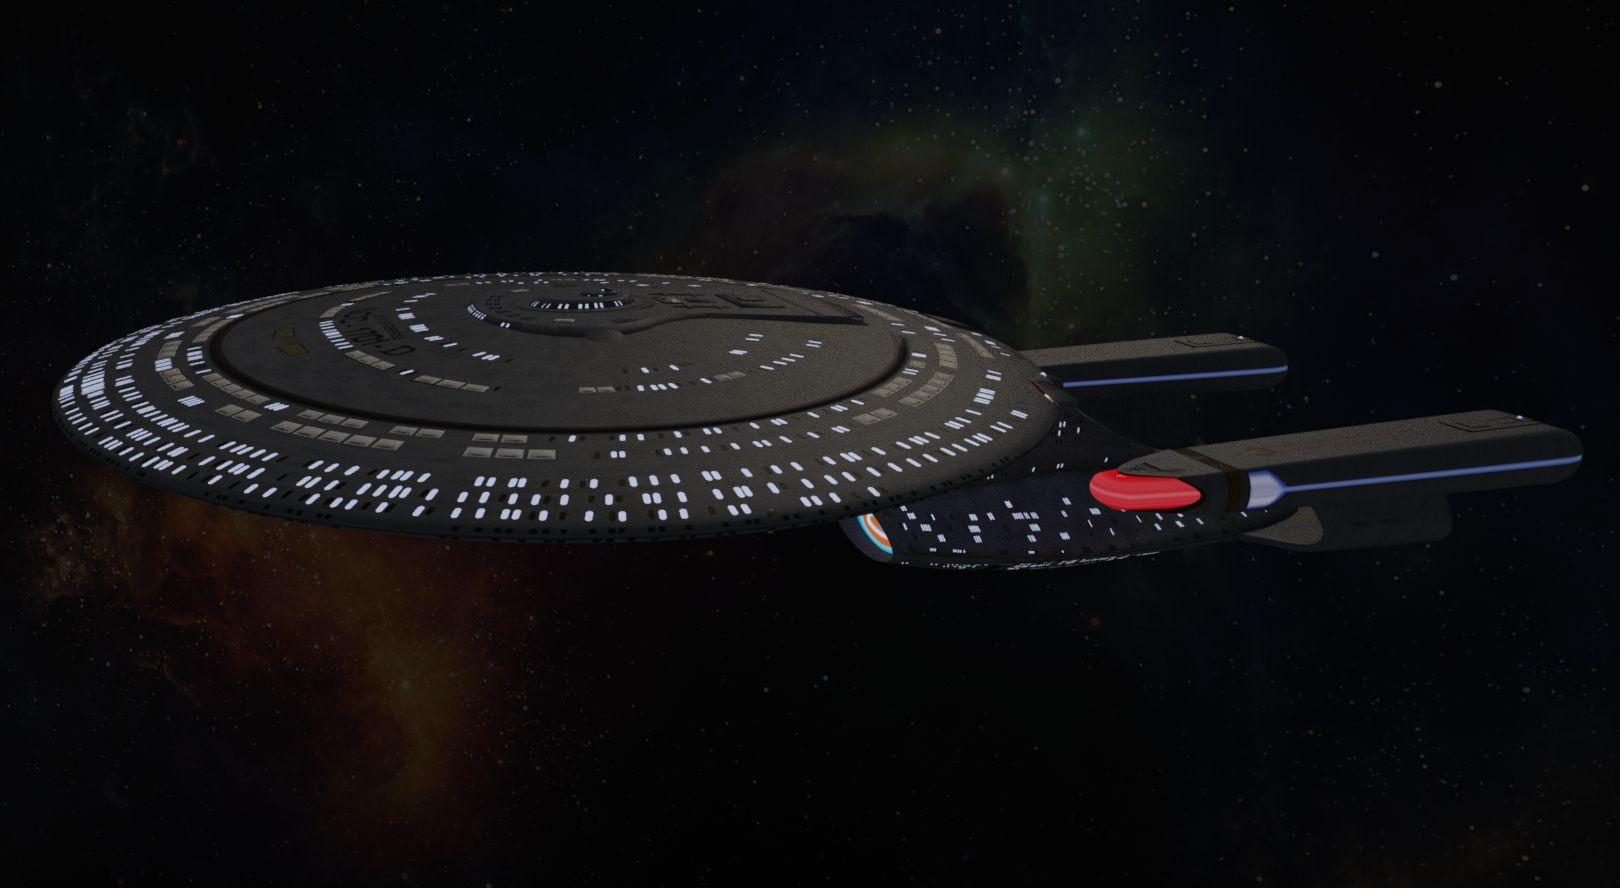 NCC 1701-D